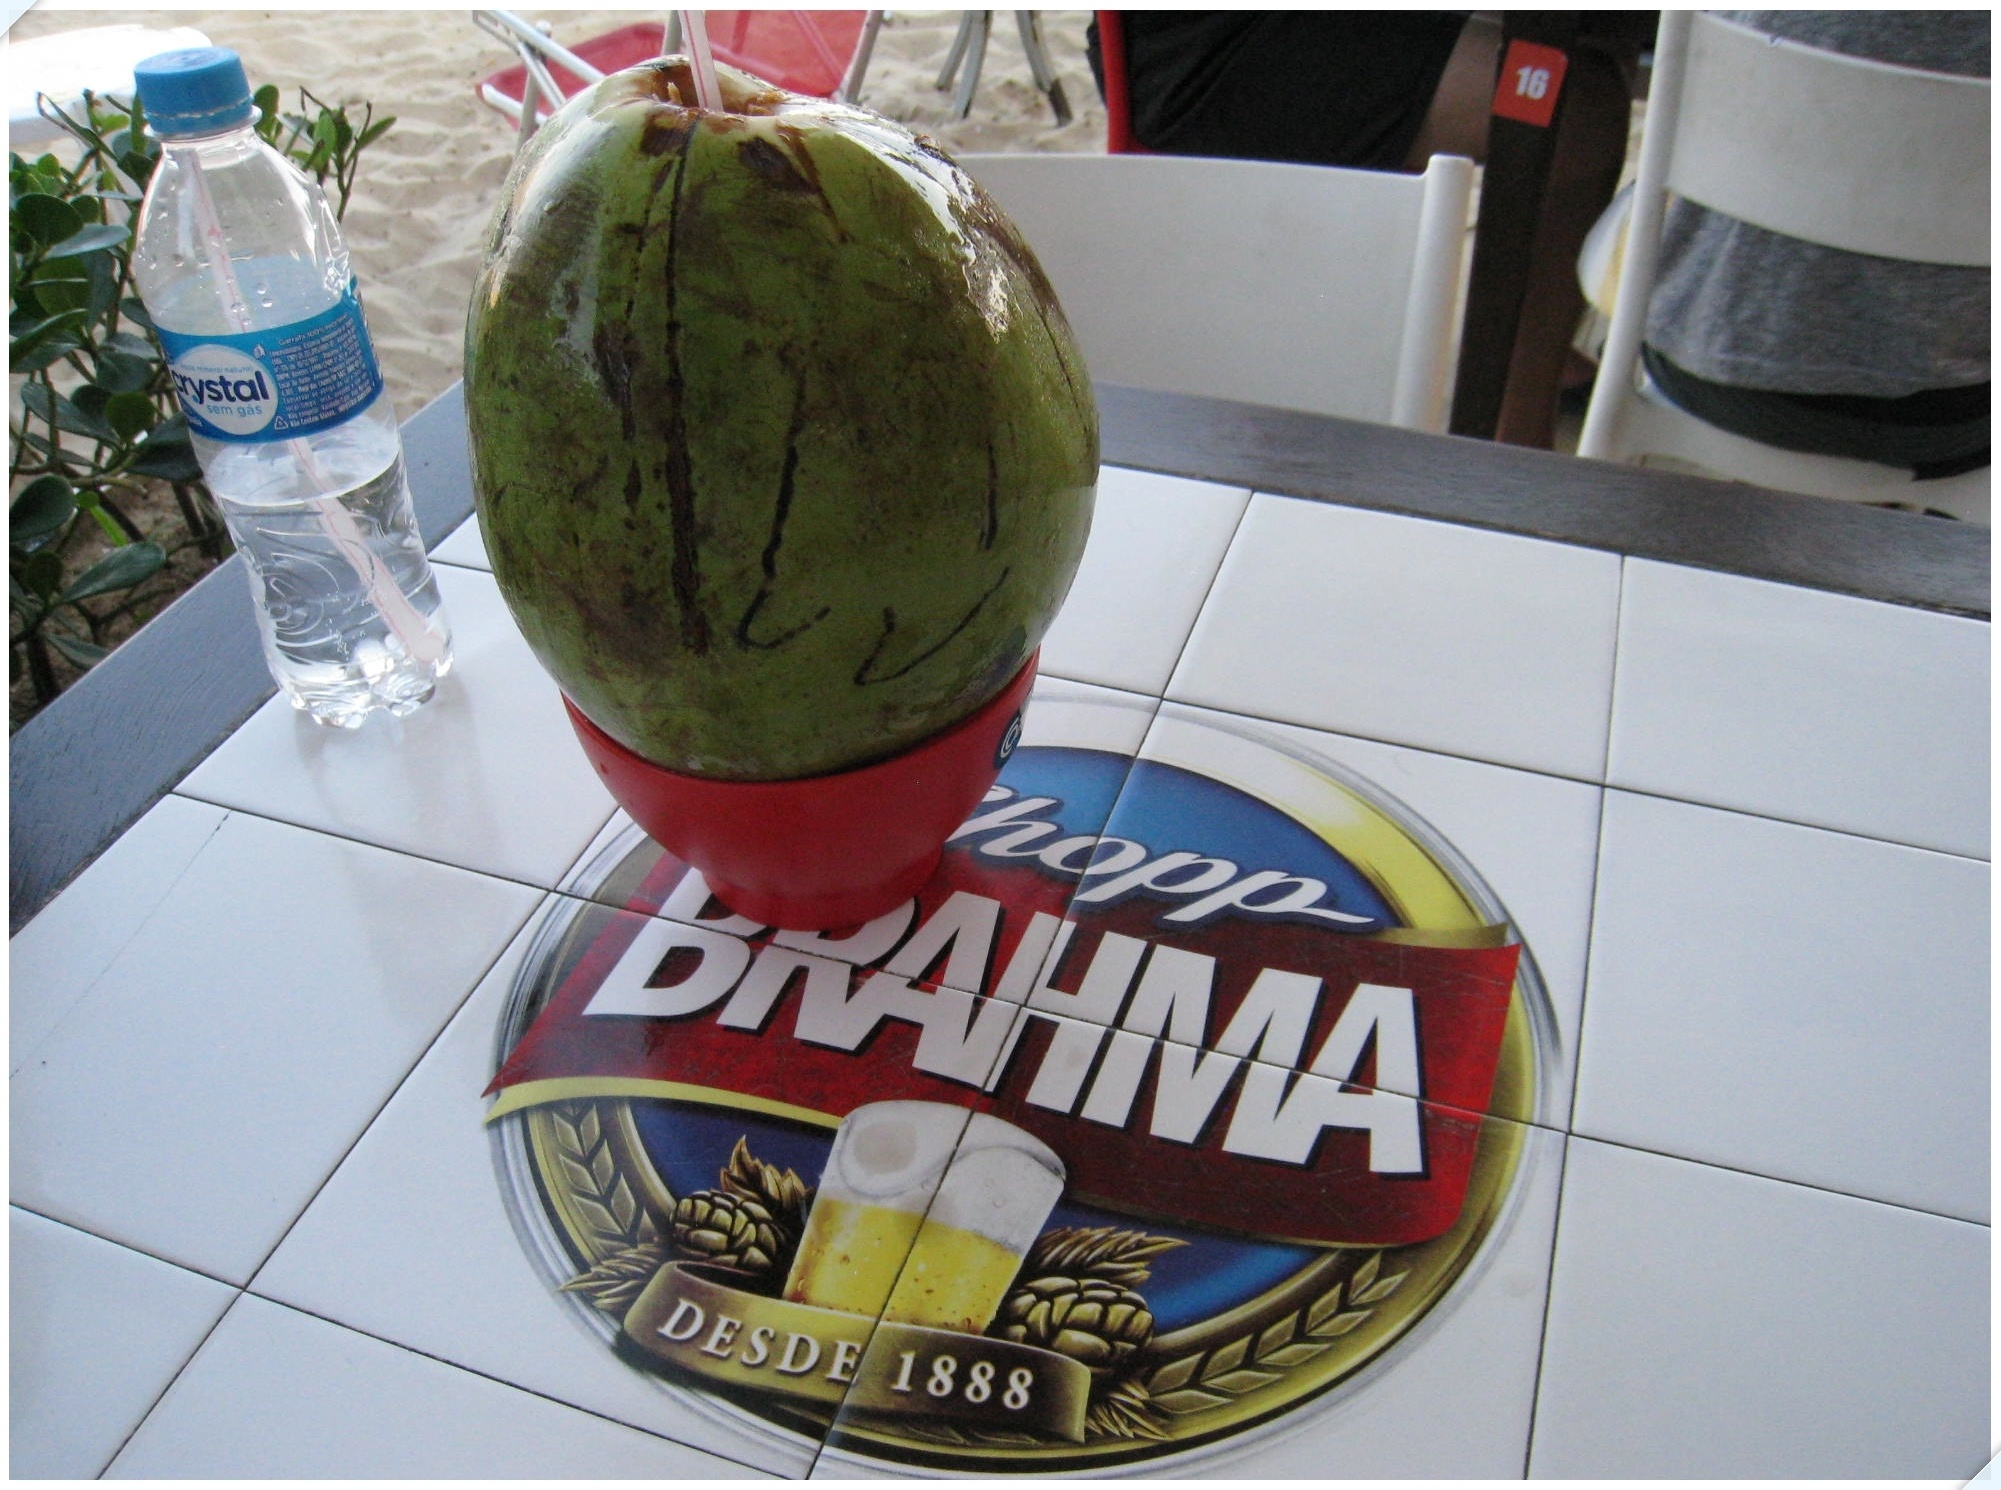 copacabana_4_920.jpg